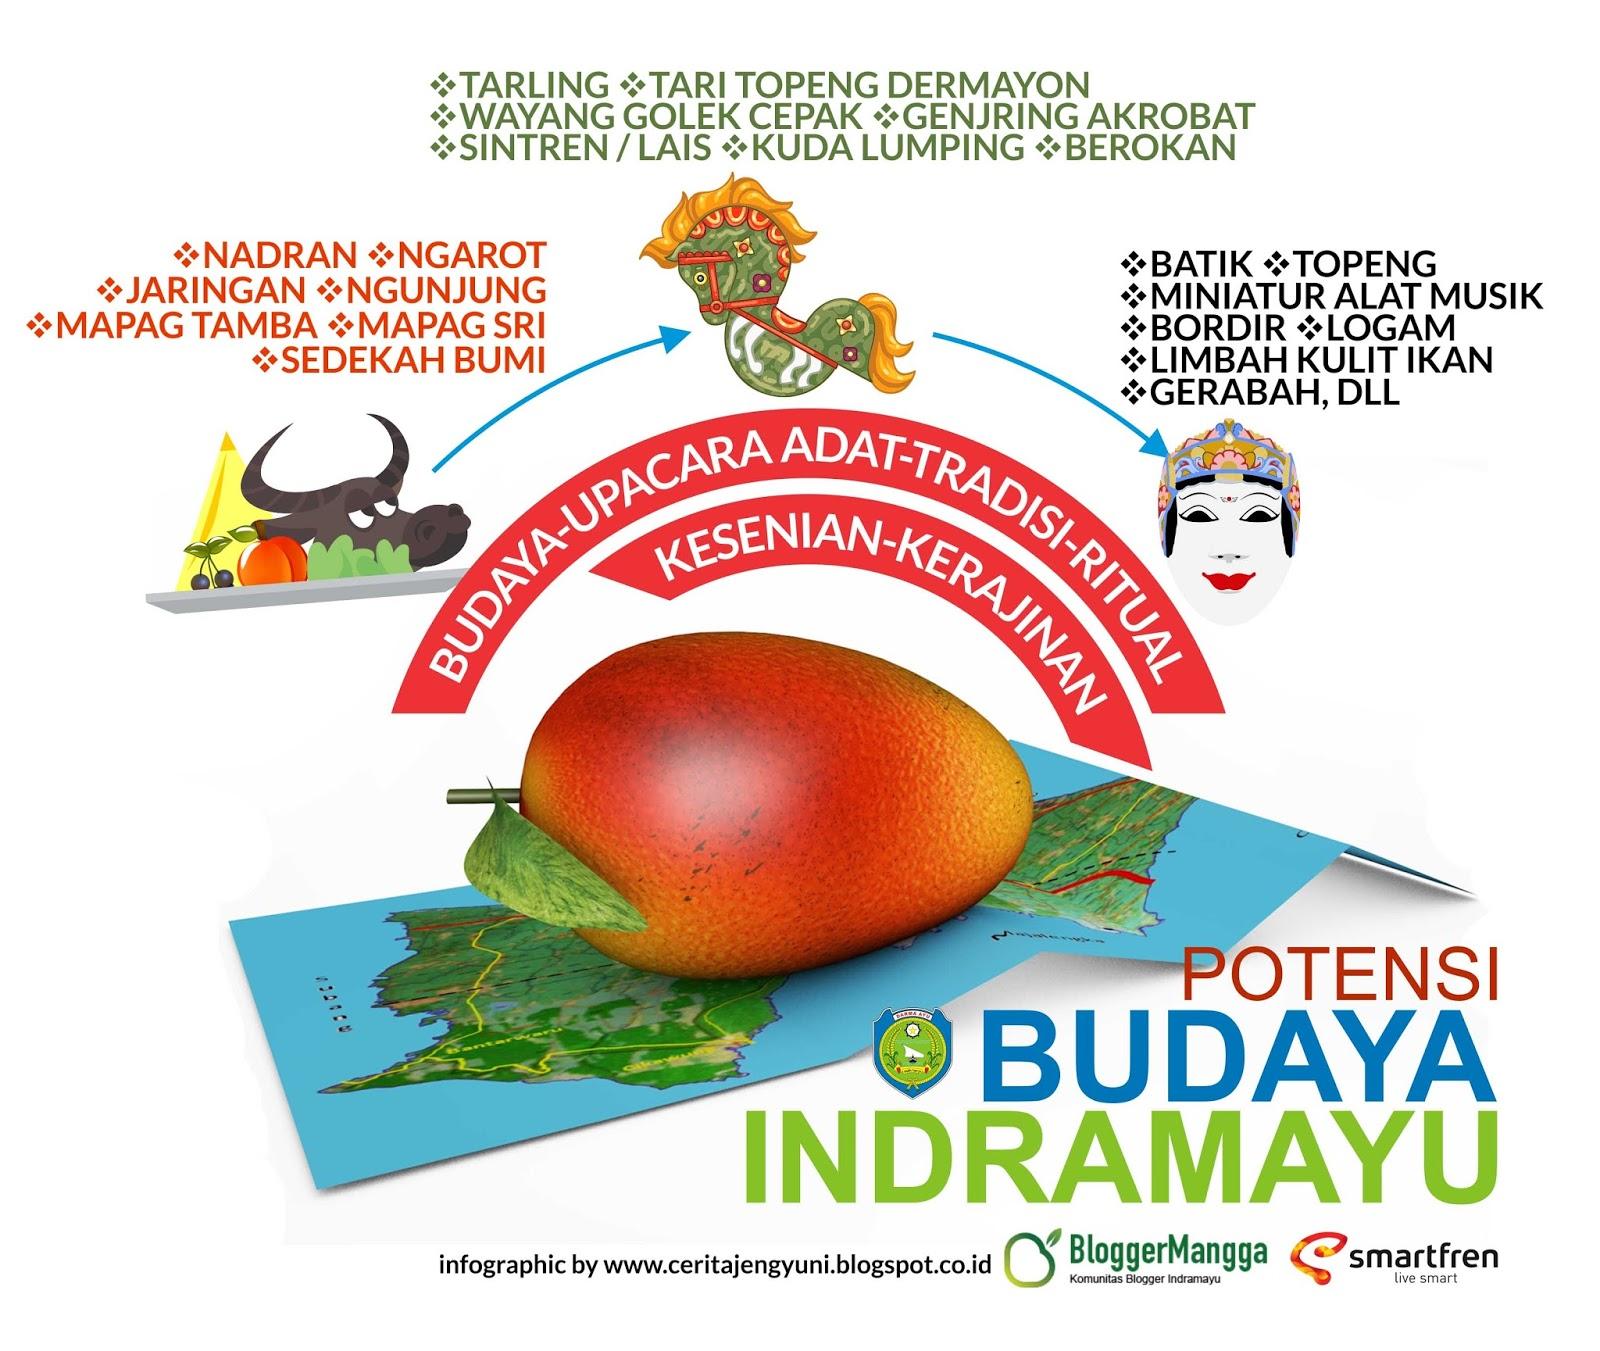 Potensi Budaya Indraamayu